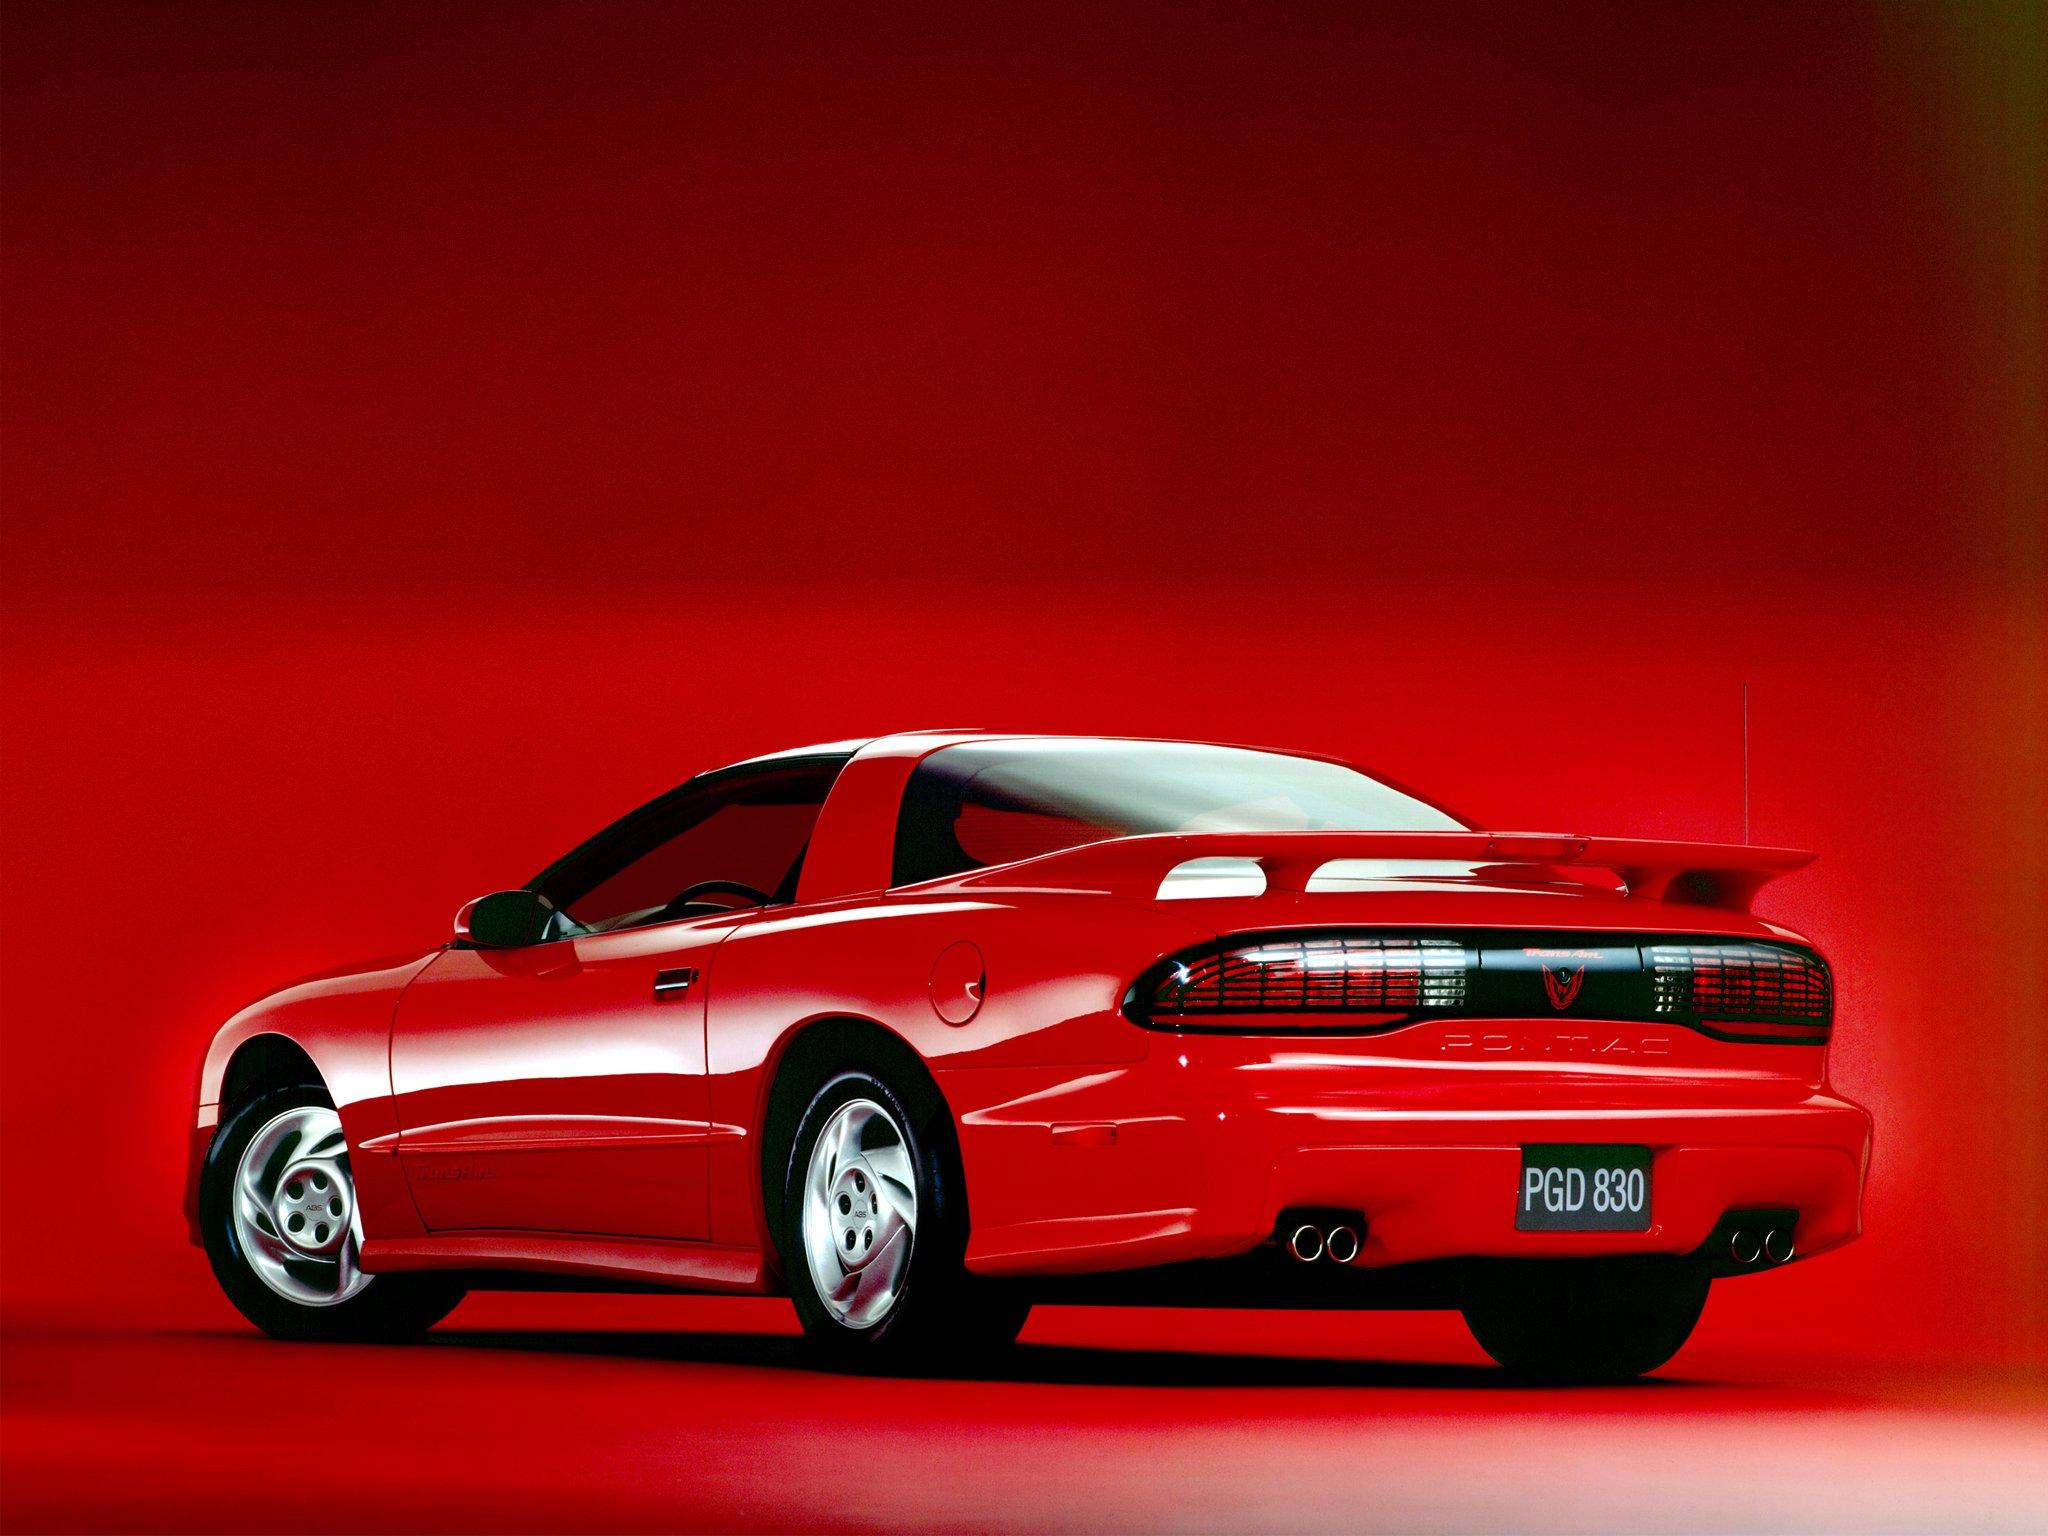 Future Cars Wallpapers Free Download 1993 97 Pontiac Firebird Trans Am Muscle Trans G Wallpaper